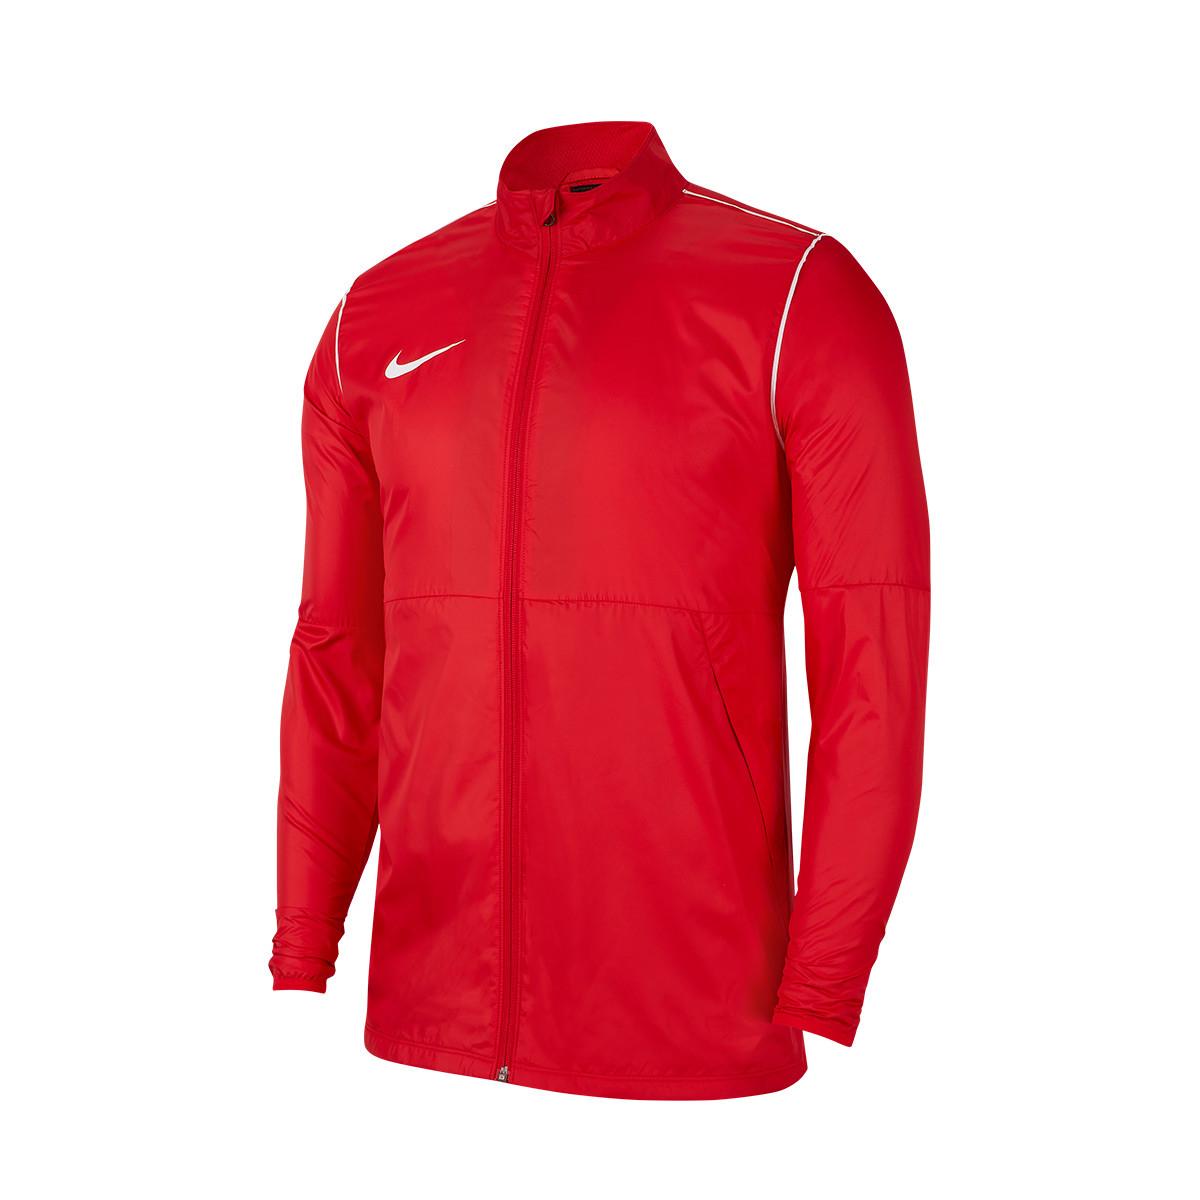 Sofisticado Disipar Embajada  Raincoat Nike Kids Park 20 Red - Football store Fútbol Emotion